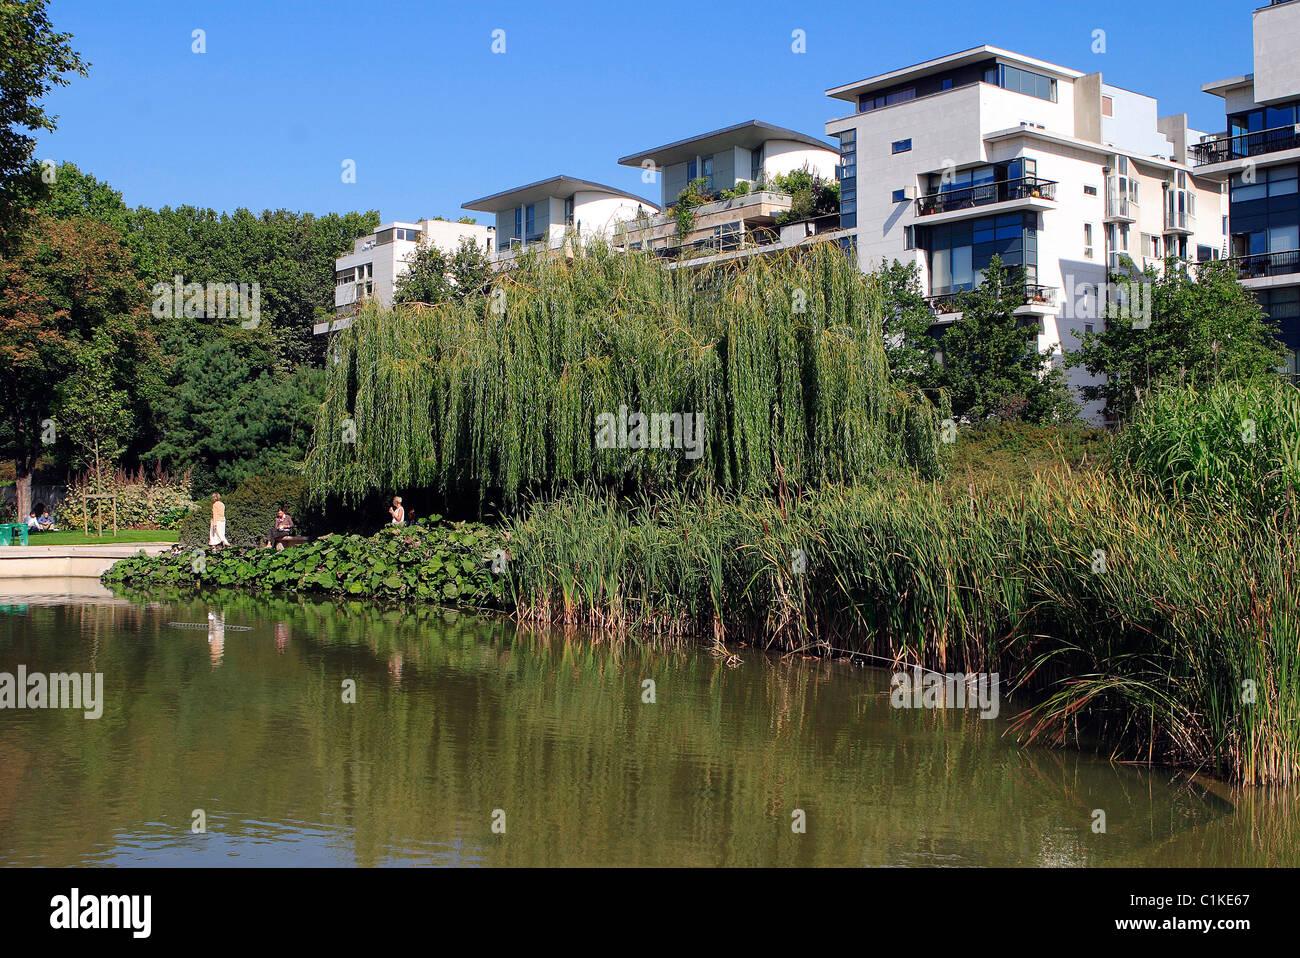 France, Paris, Park of Bercy - Stock Image